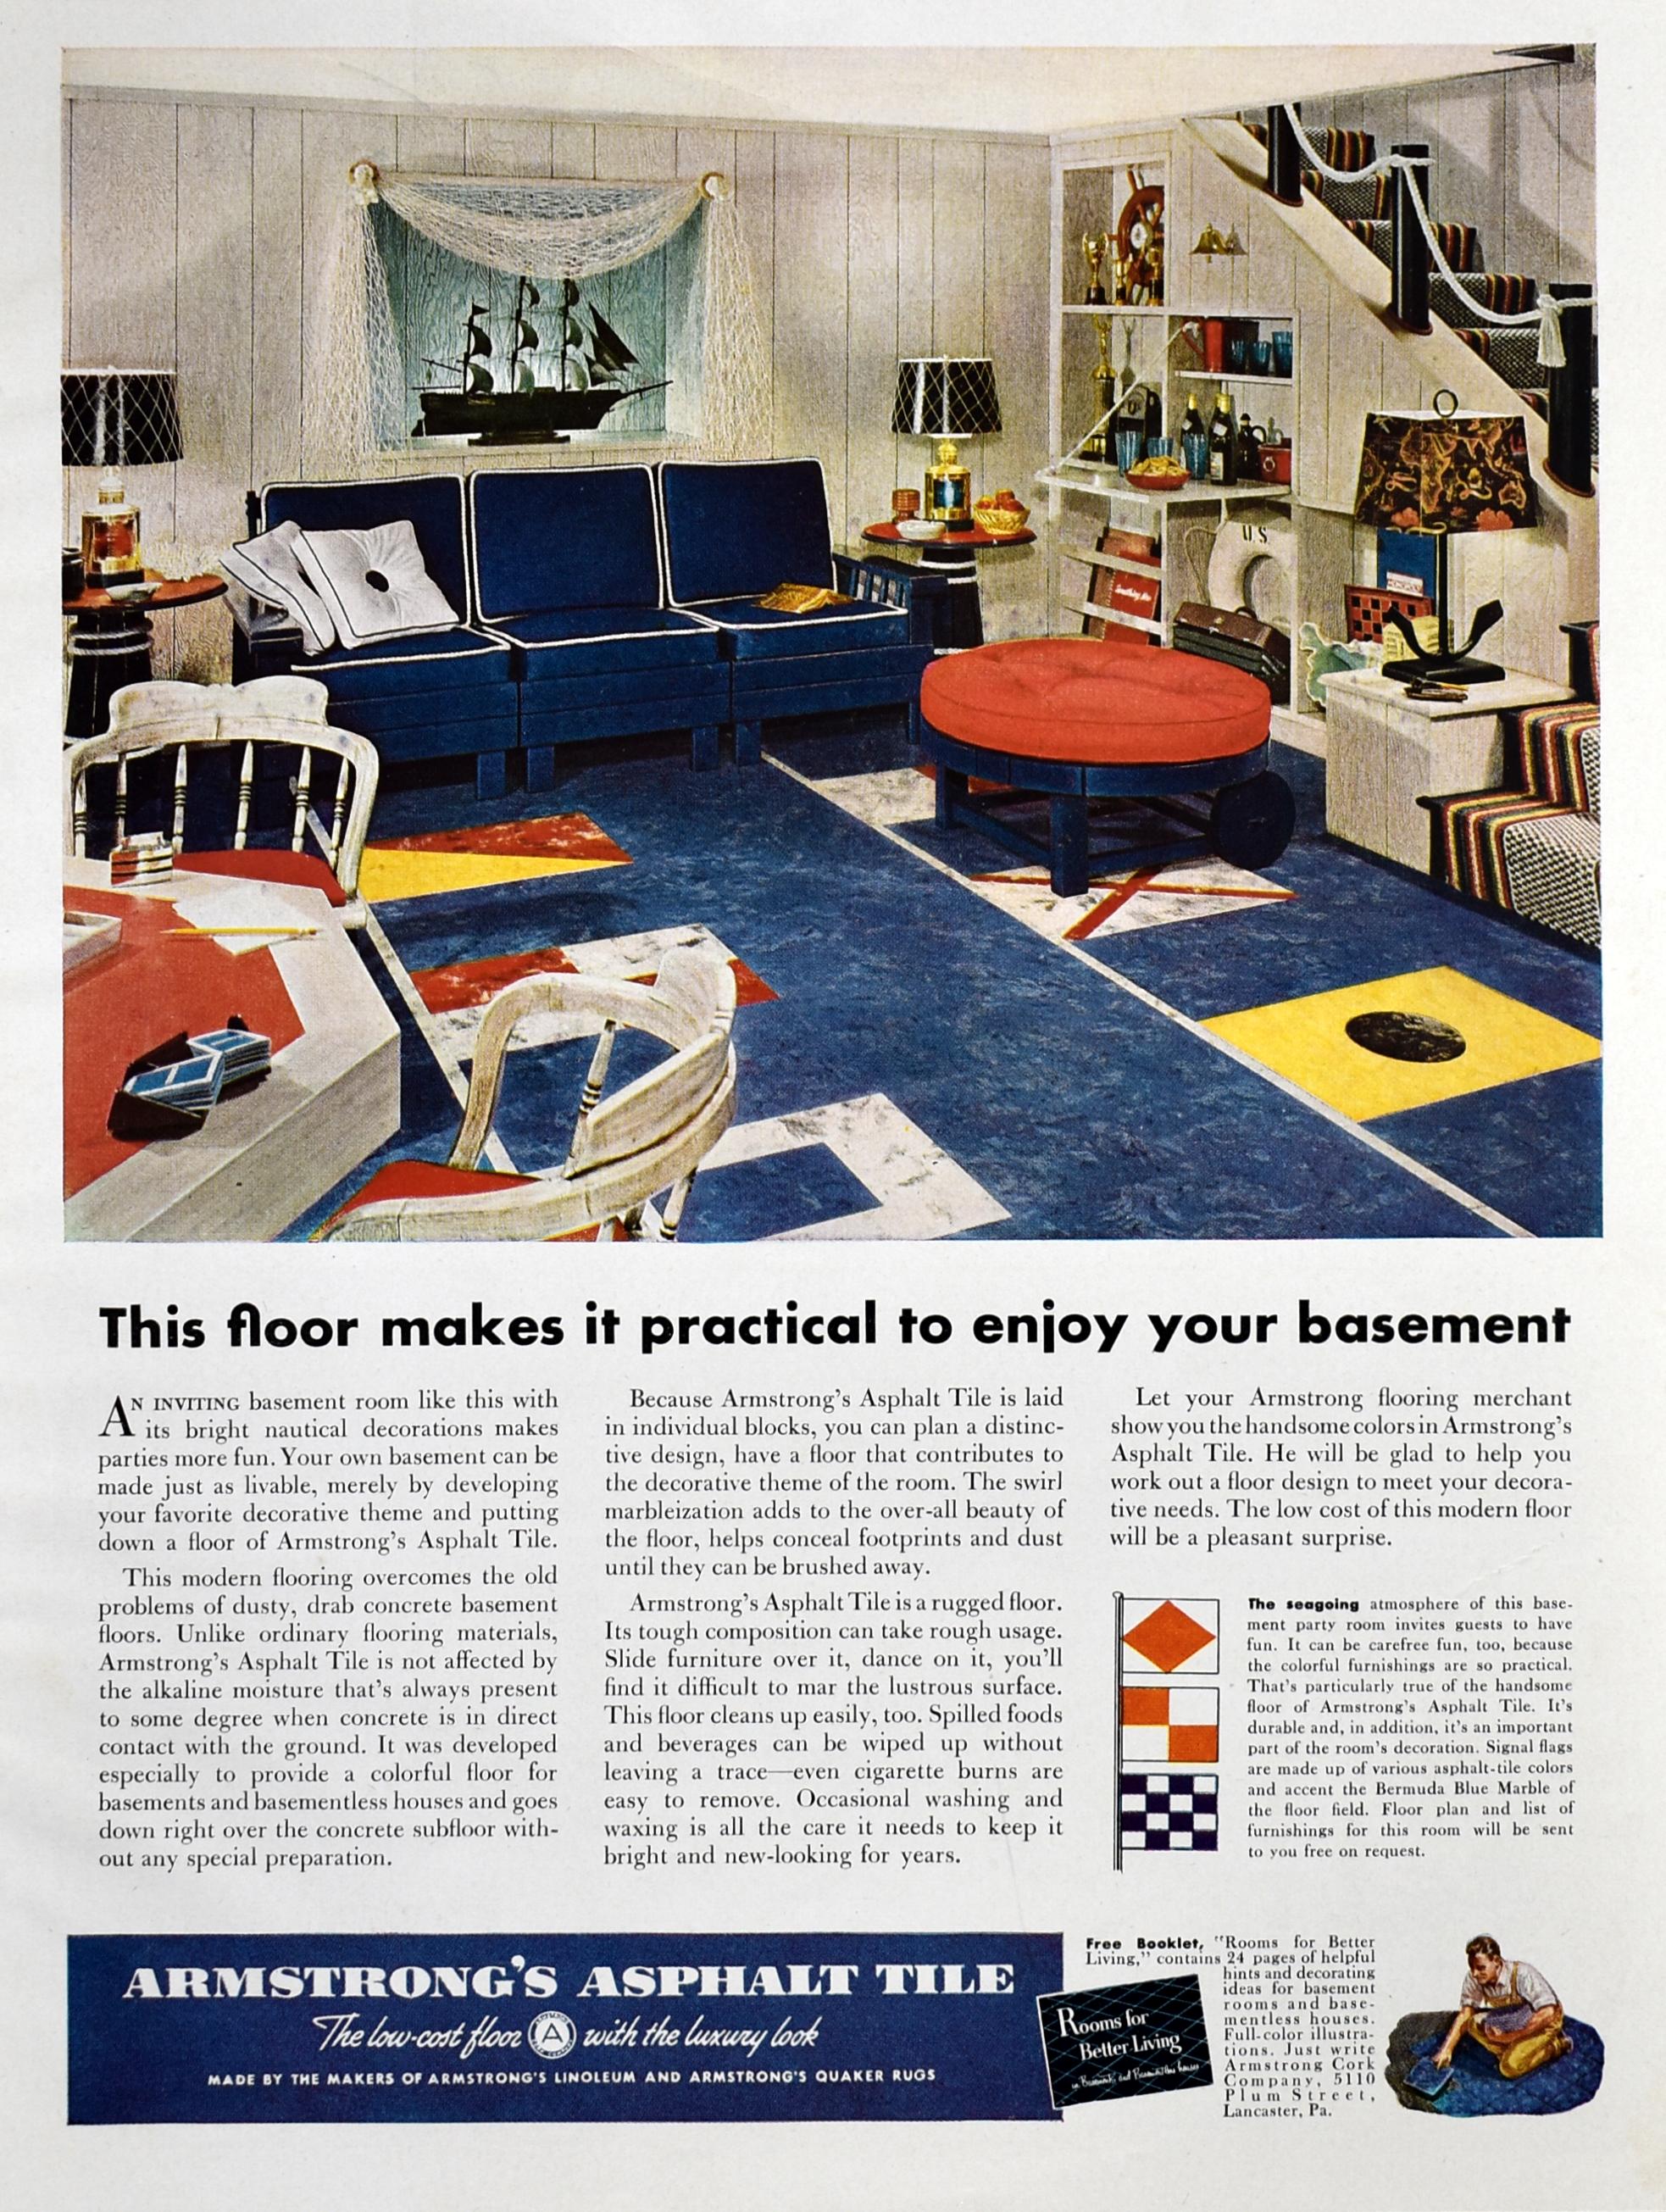 Vintage 1951 Armstrong Asphalt Tile Floor Ad Retro 50s Nautical Game Room Decor Retro Reveries Game Room Decor 1950s Decor Decor